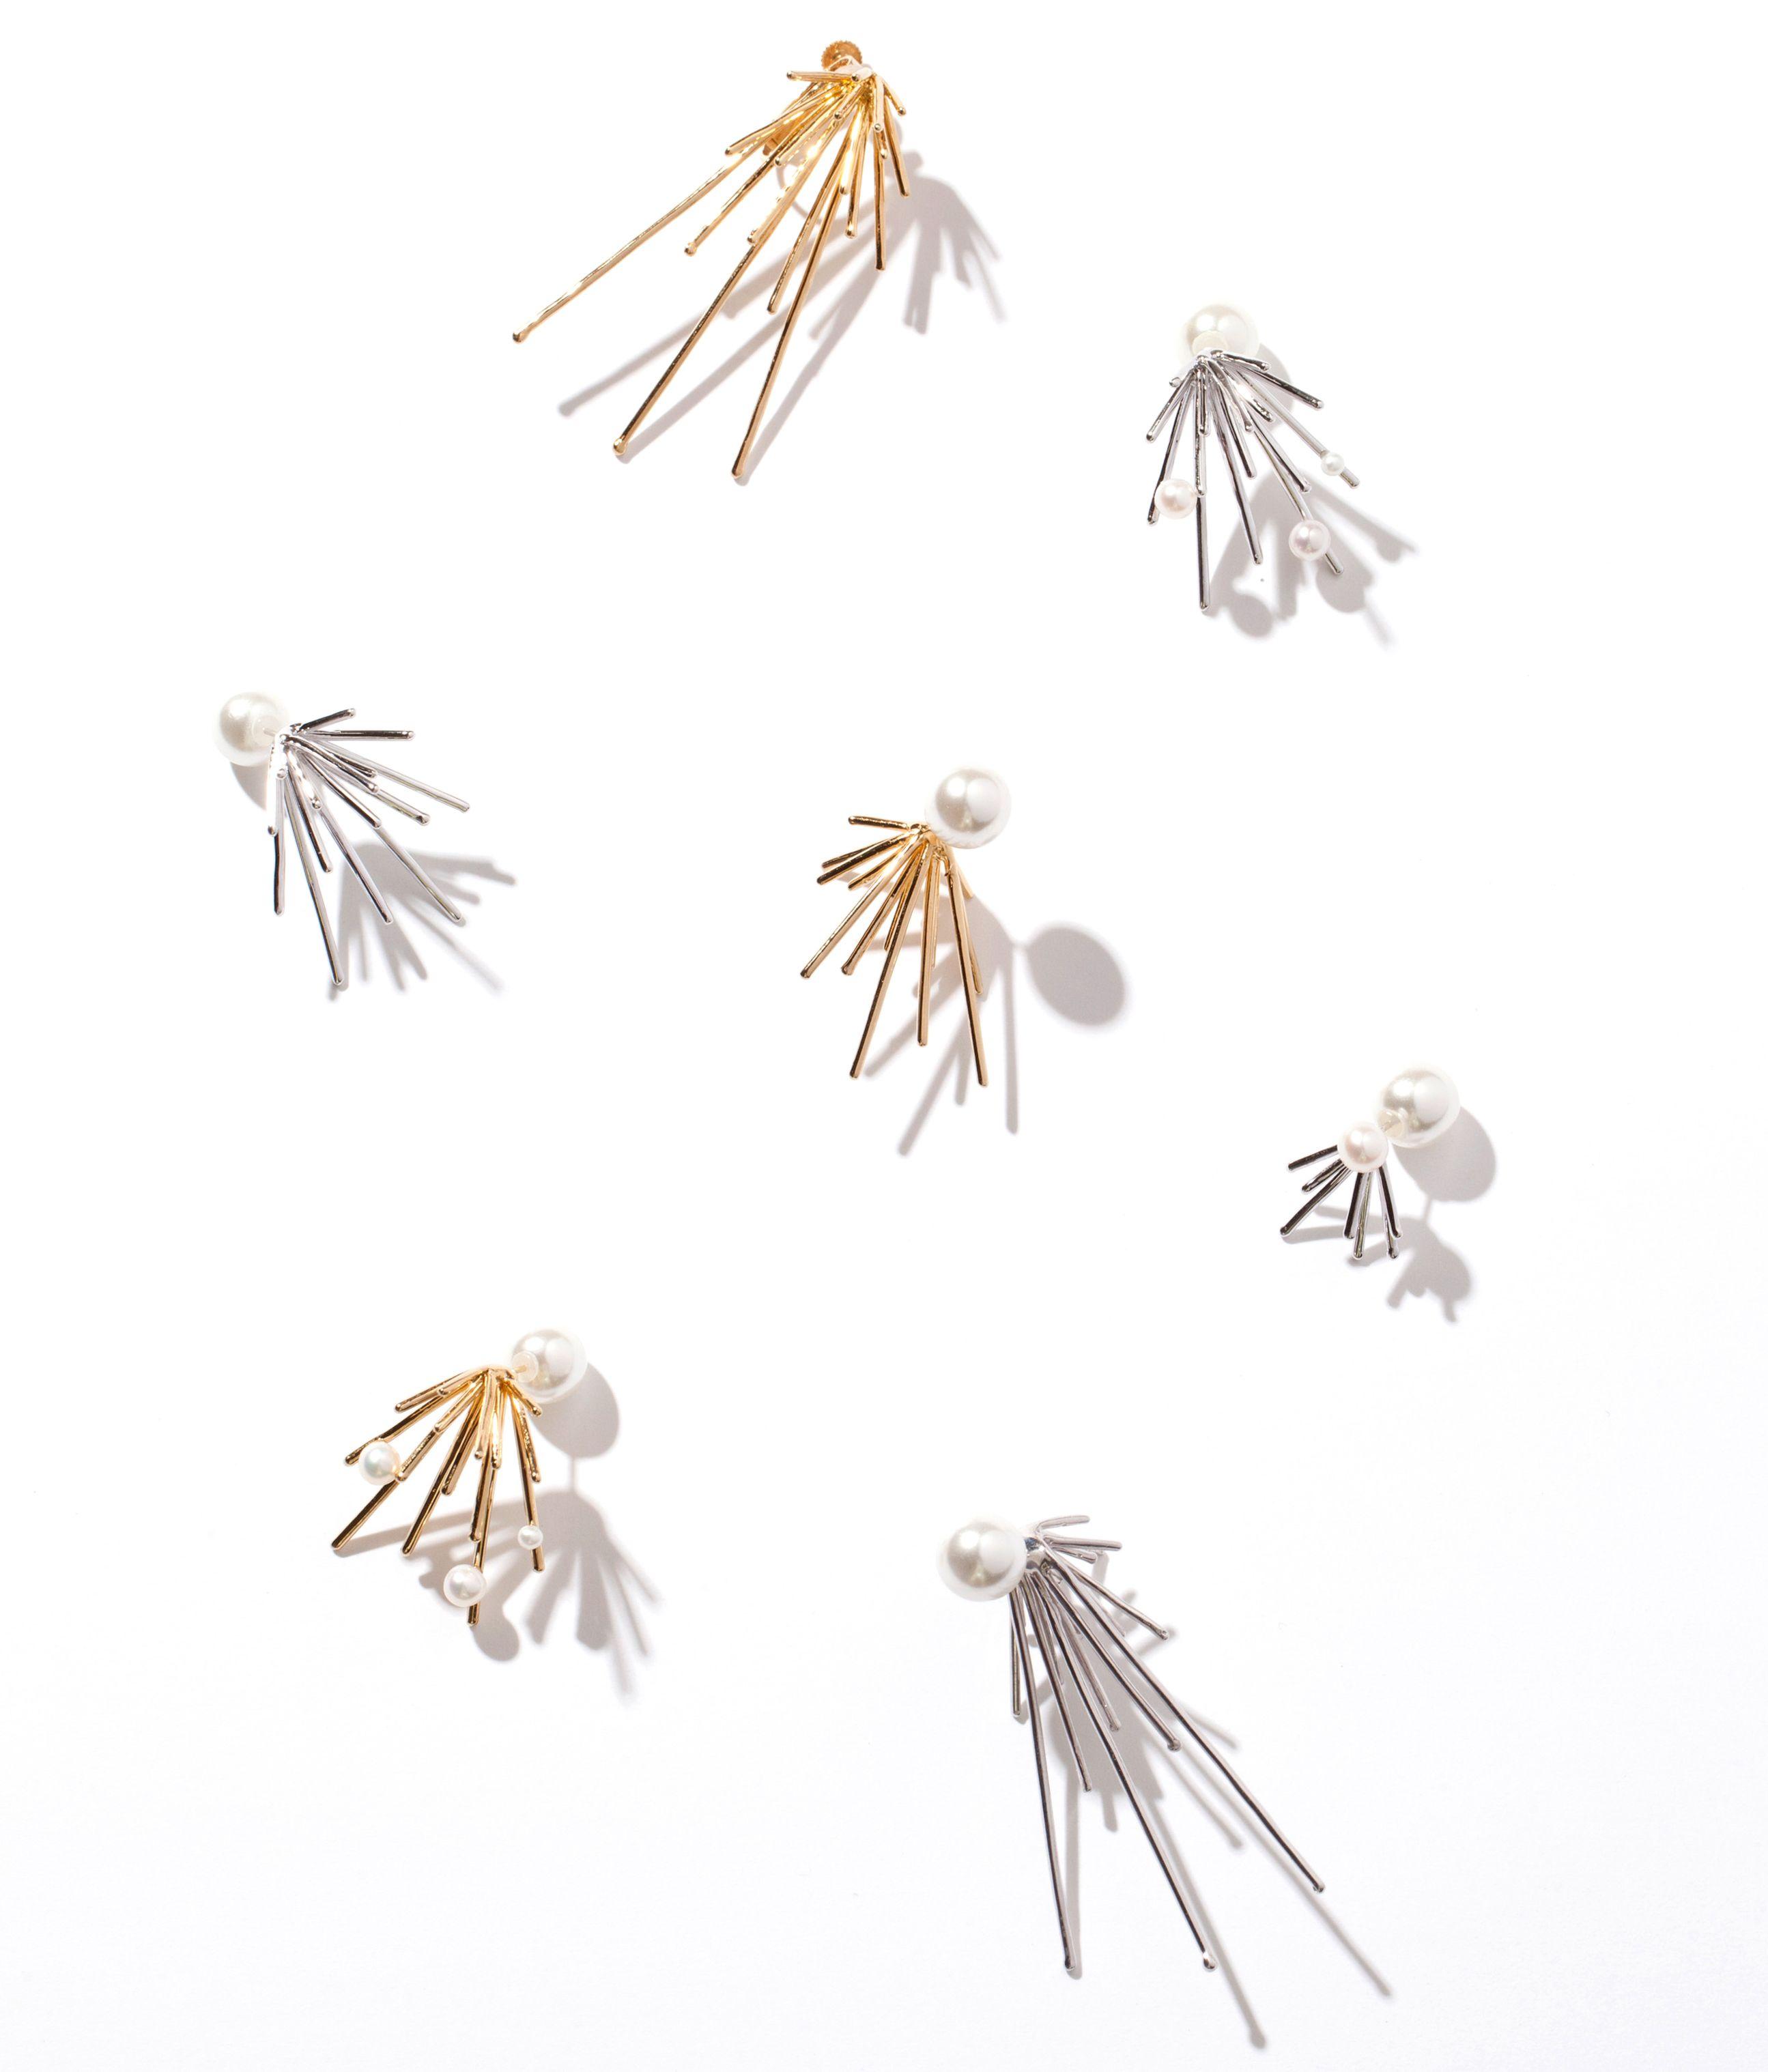 Collection Lamie ラミエ Jewelry Accessory Brand Jewelry Lookbook Jewelry Branding Sequin Accessories